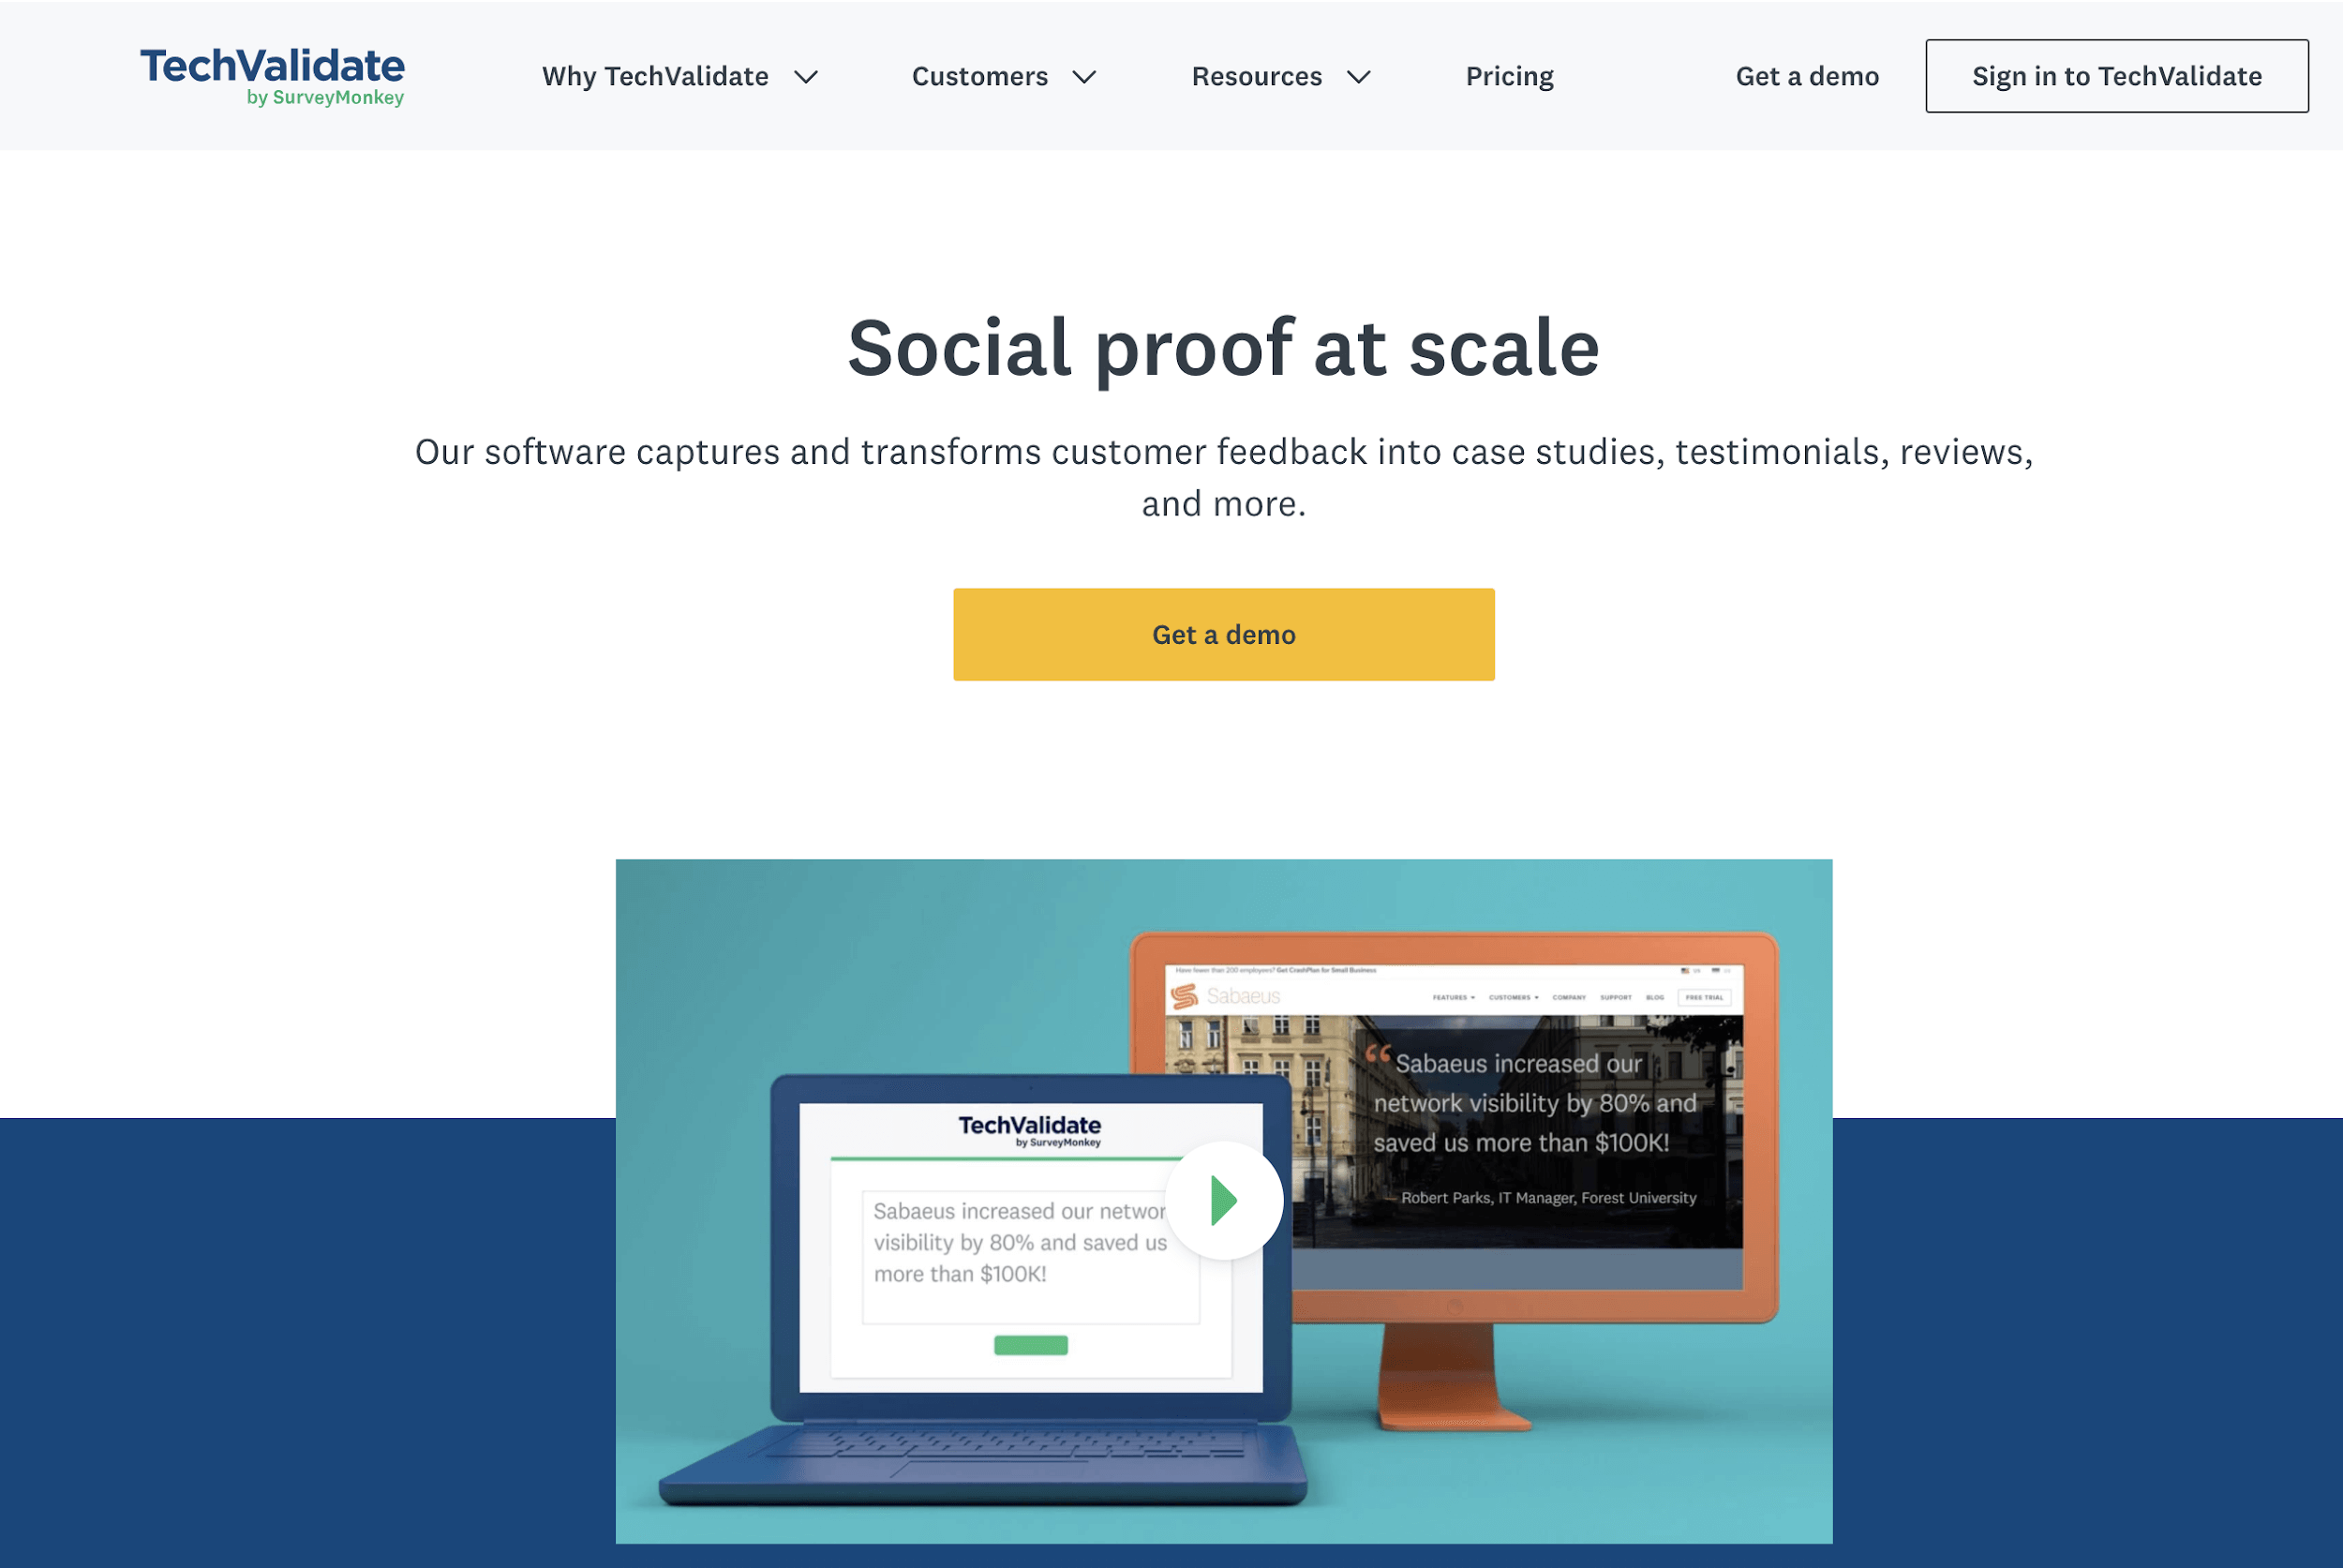 The TechValidate by SurveyMonkey platform